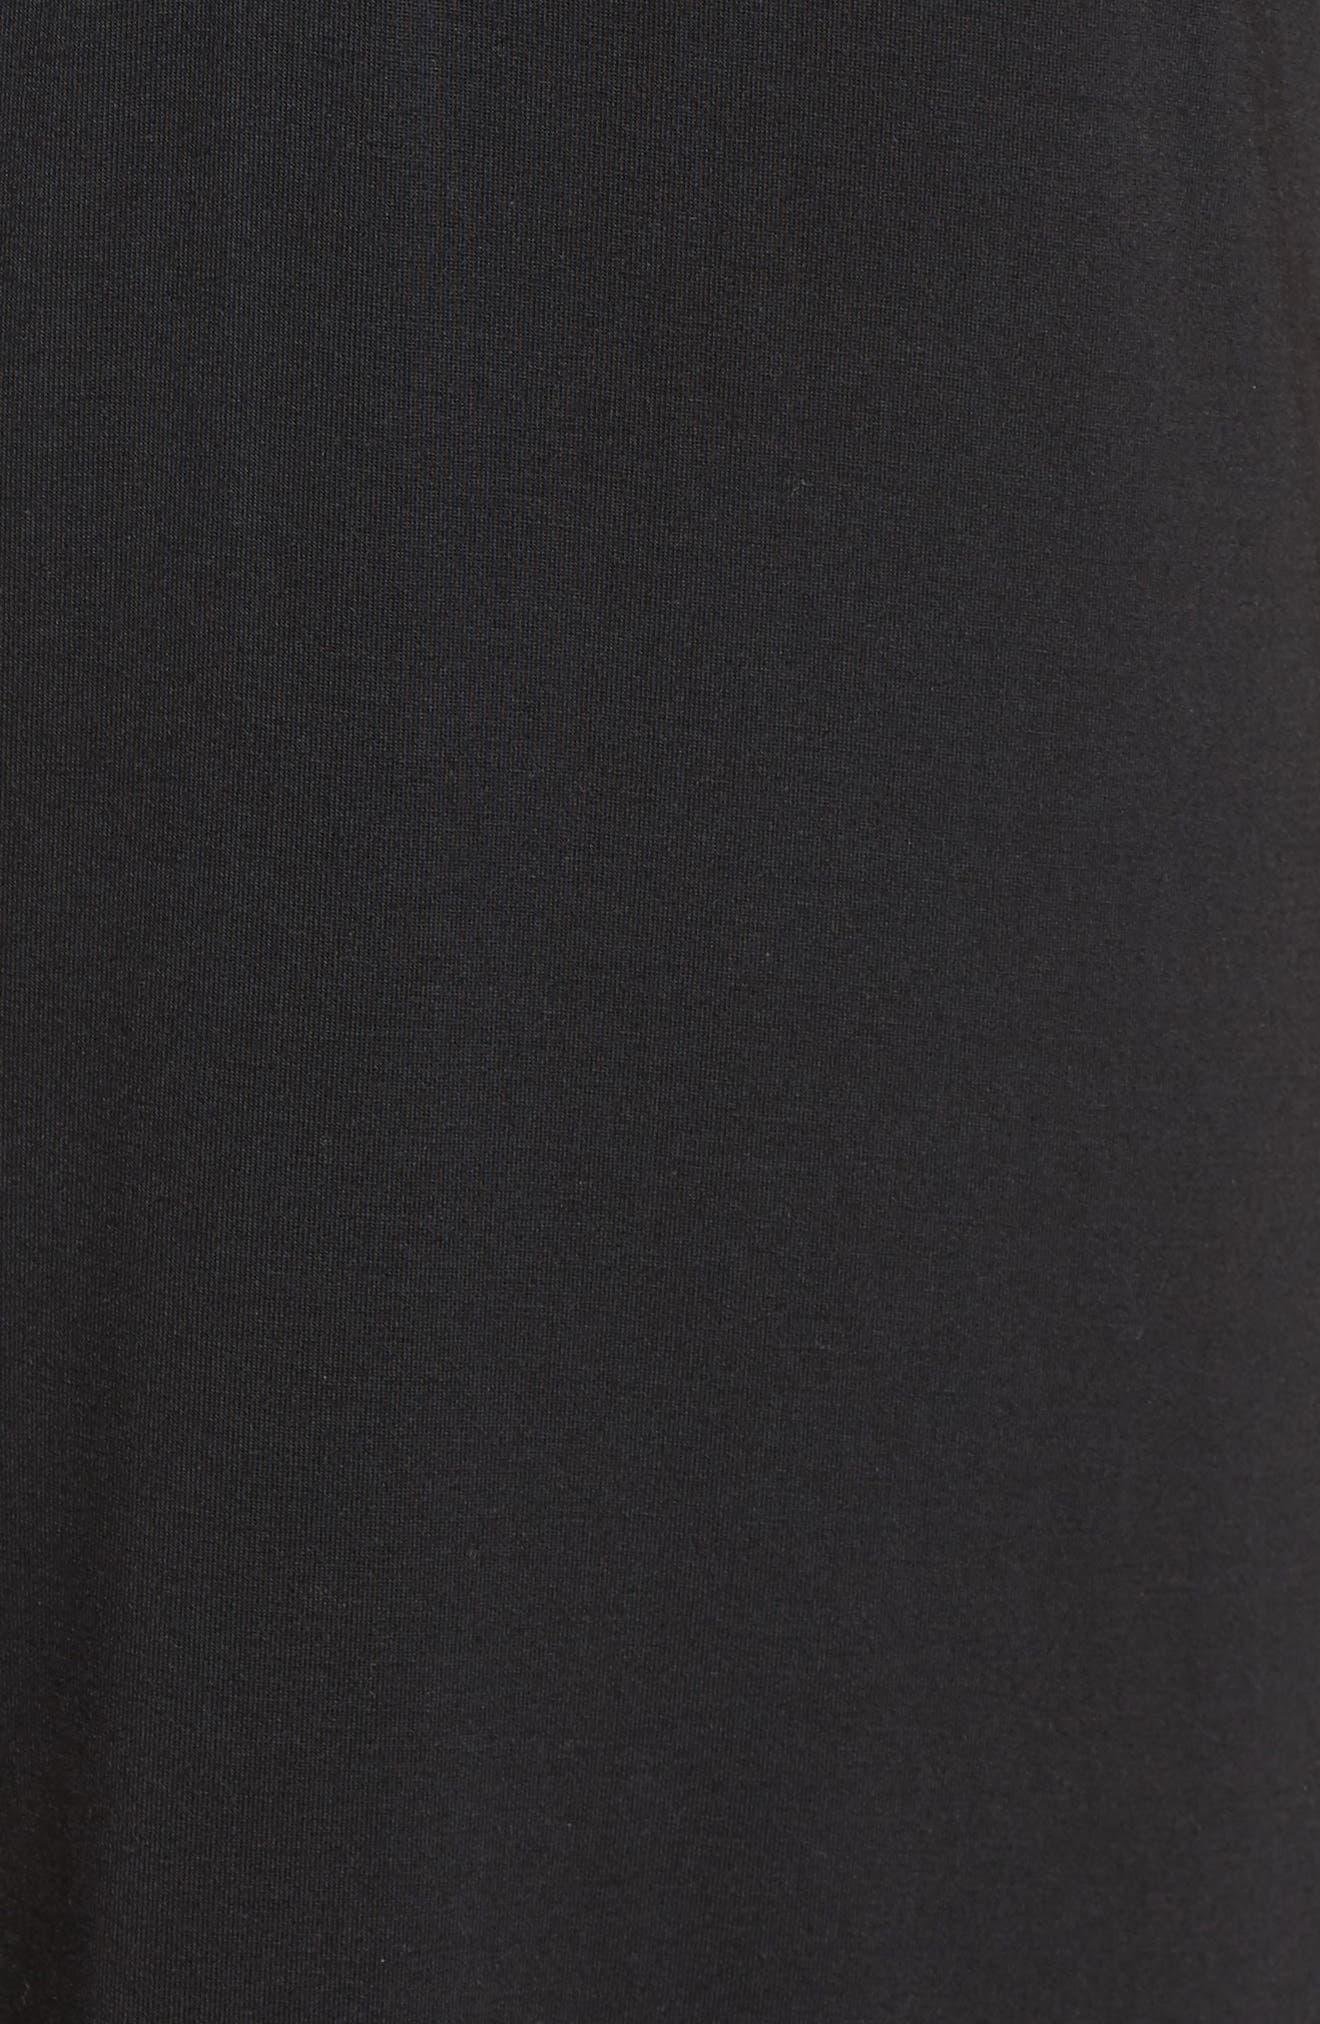 Sleep Shirt,                             Alternate thumbnail 5, color,                             BLACK